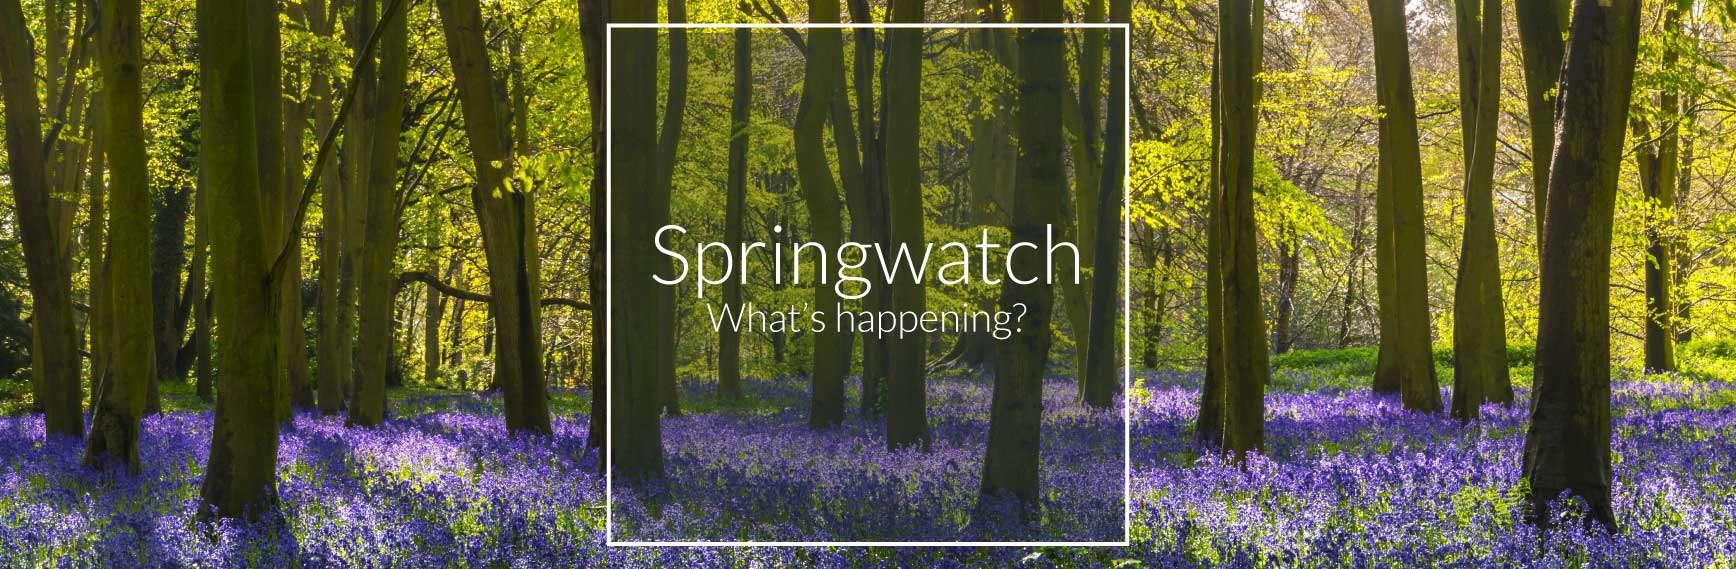 Springwatch 2018 – What's Happening so far?